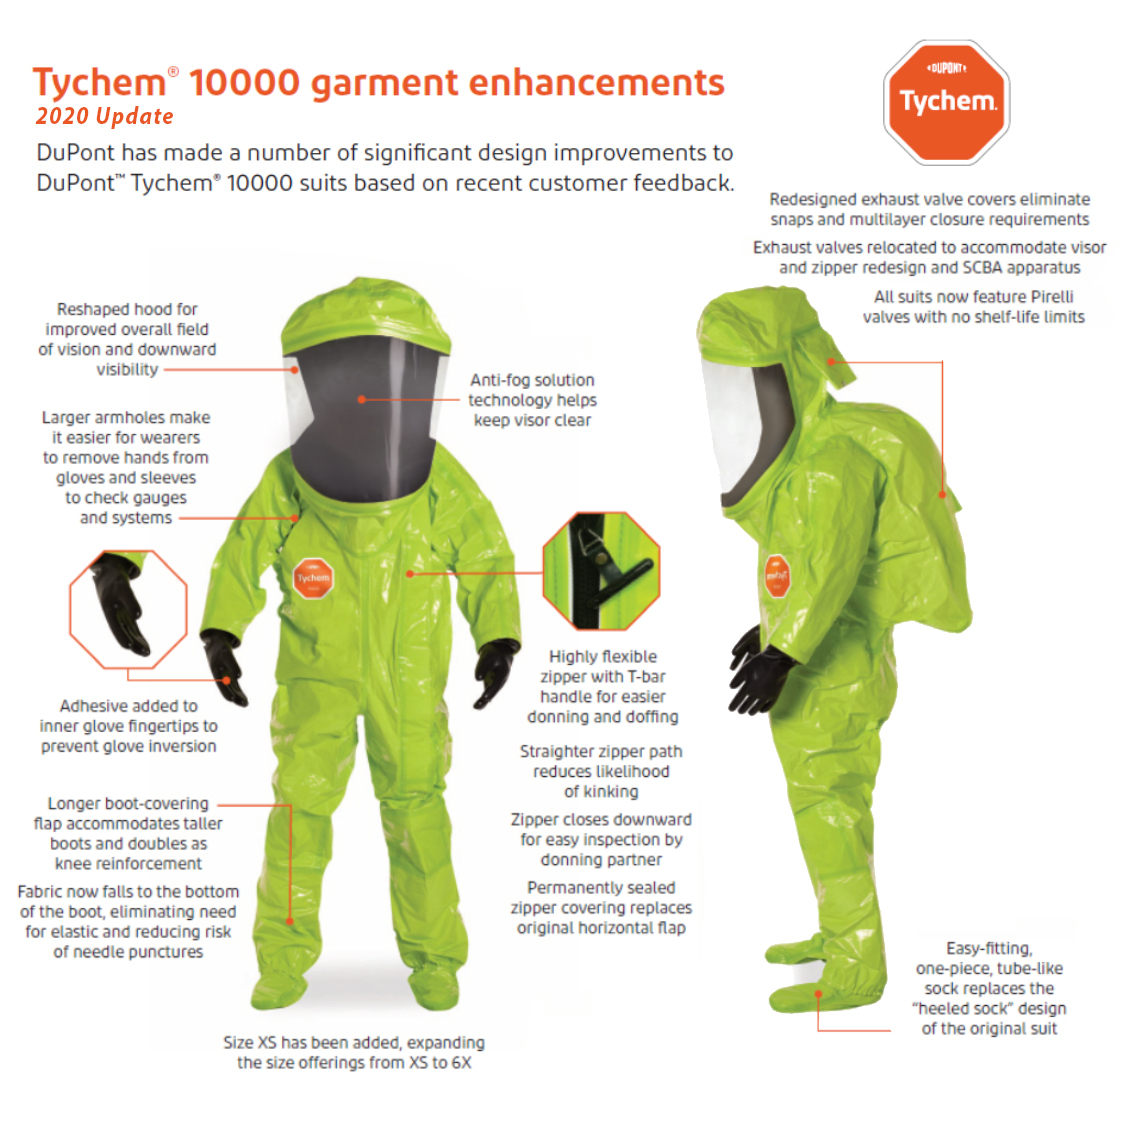 DuPont Tychem 10000 Level A Suit 2020 Updates image